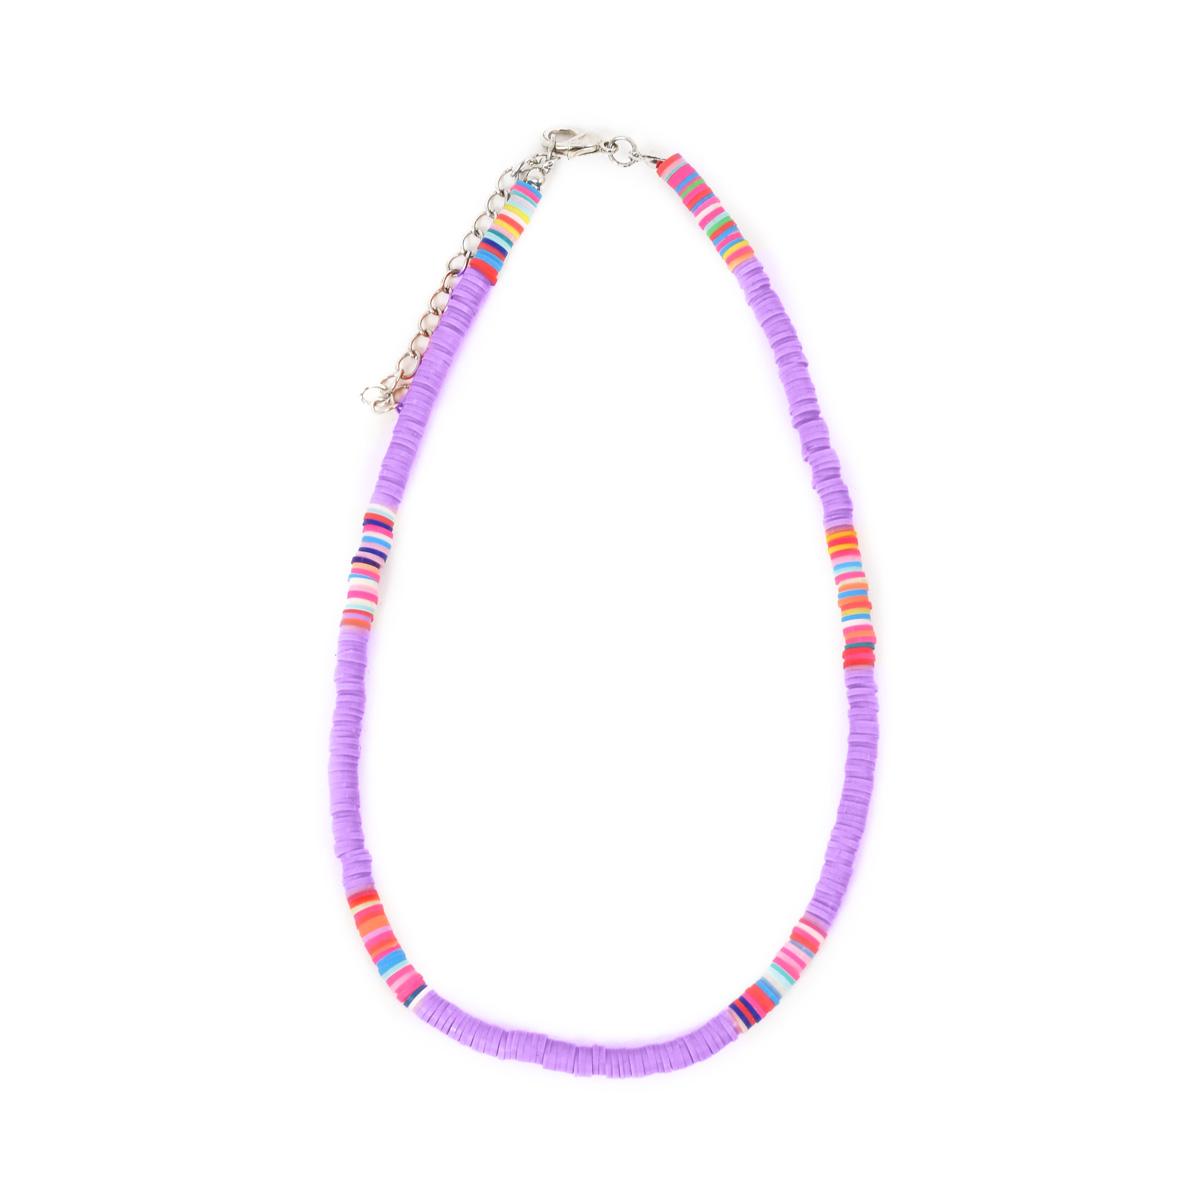 Collier Maasaï lilas